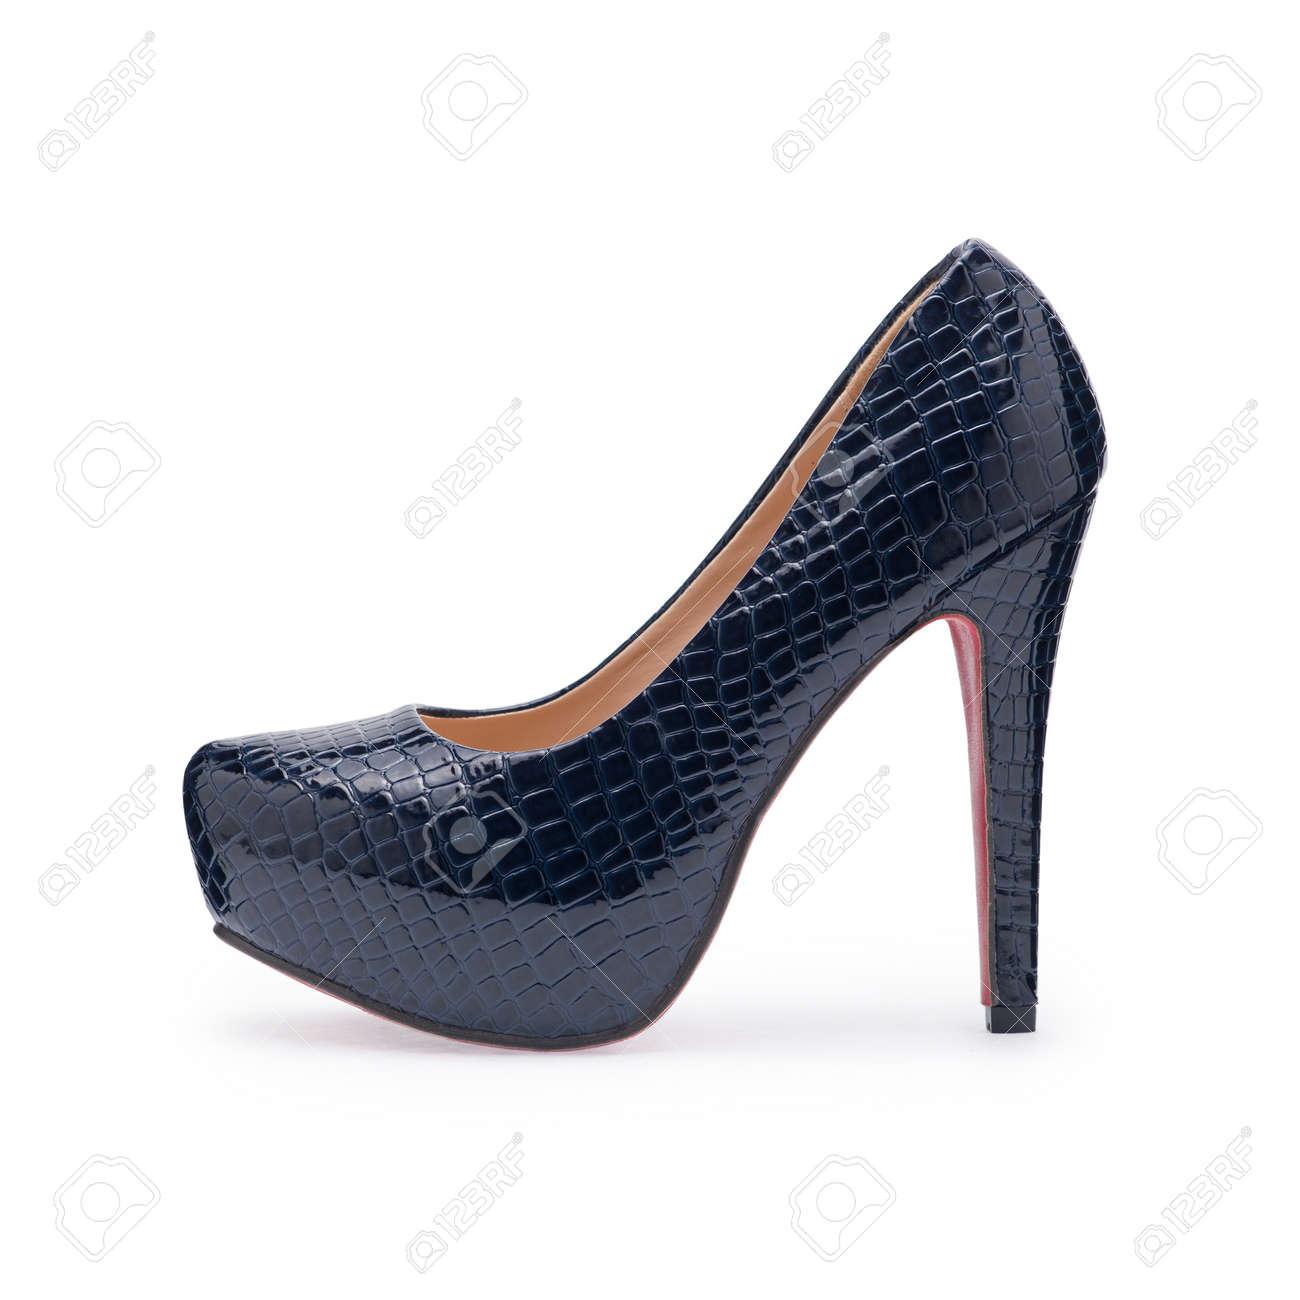 Fashion week Womens stylish shoes for lady